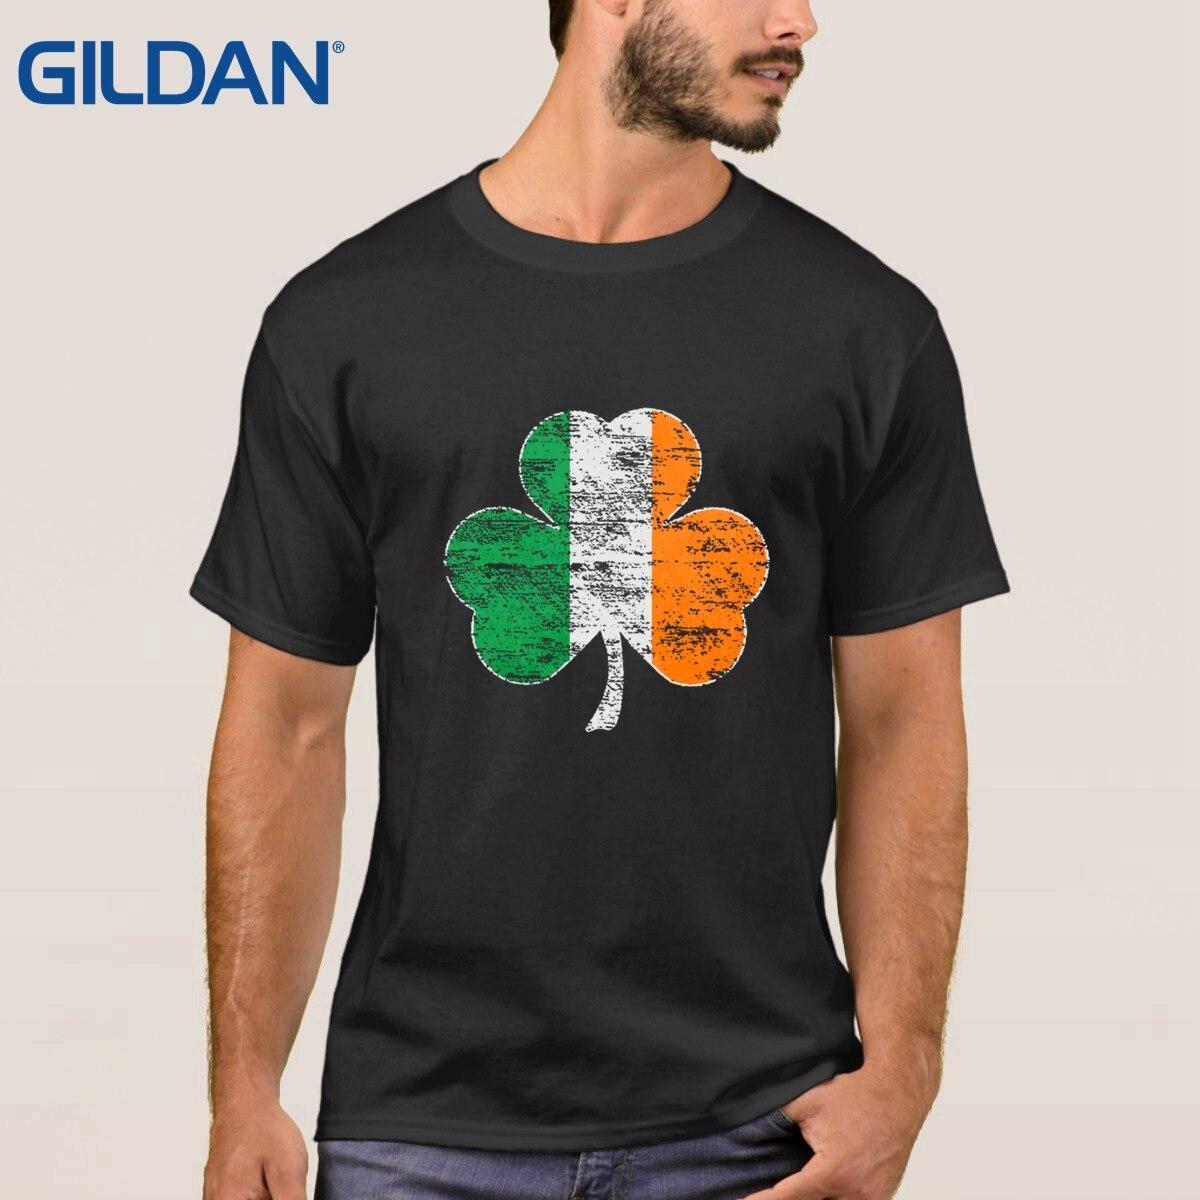 Black flag t shirt vintage - 2017 New T Shirt Vintage Irish Flag Shamrock High Black For Men Tee Shirts Polyester Cloth